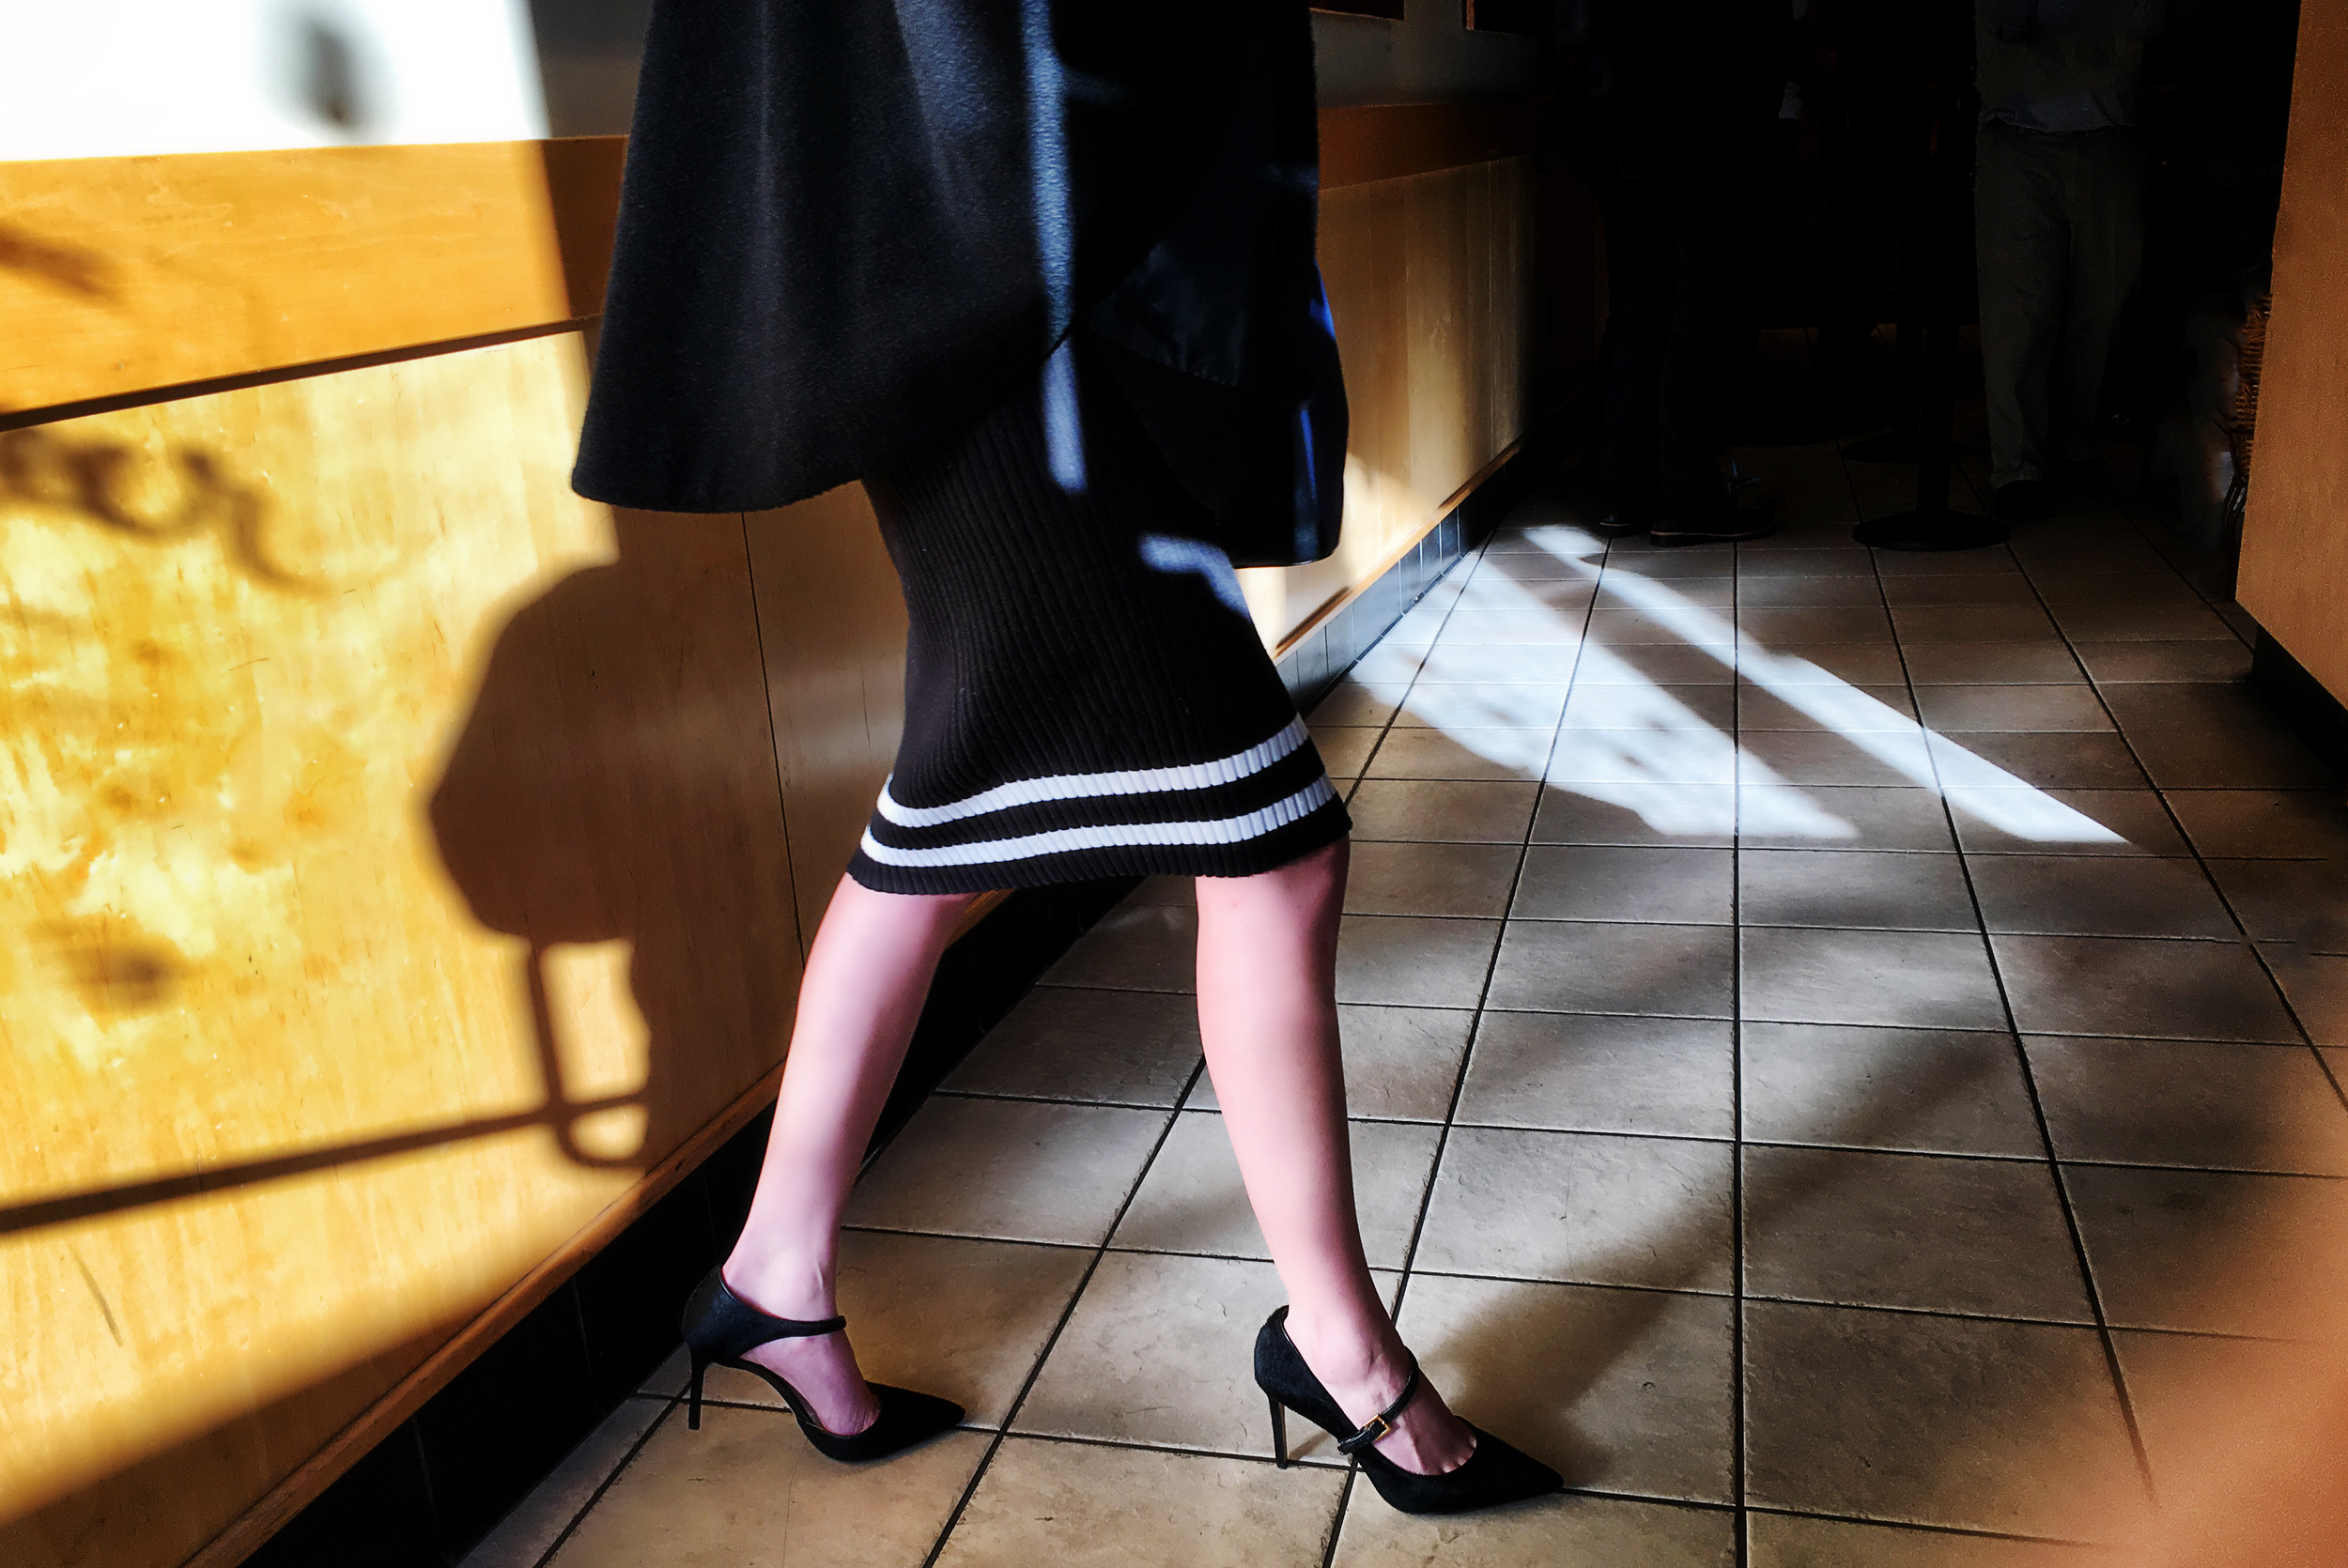 starbucks-lady-in-heels-frapaccino.jpg